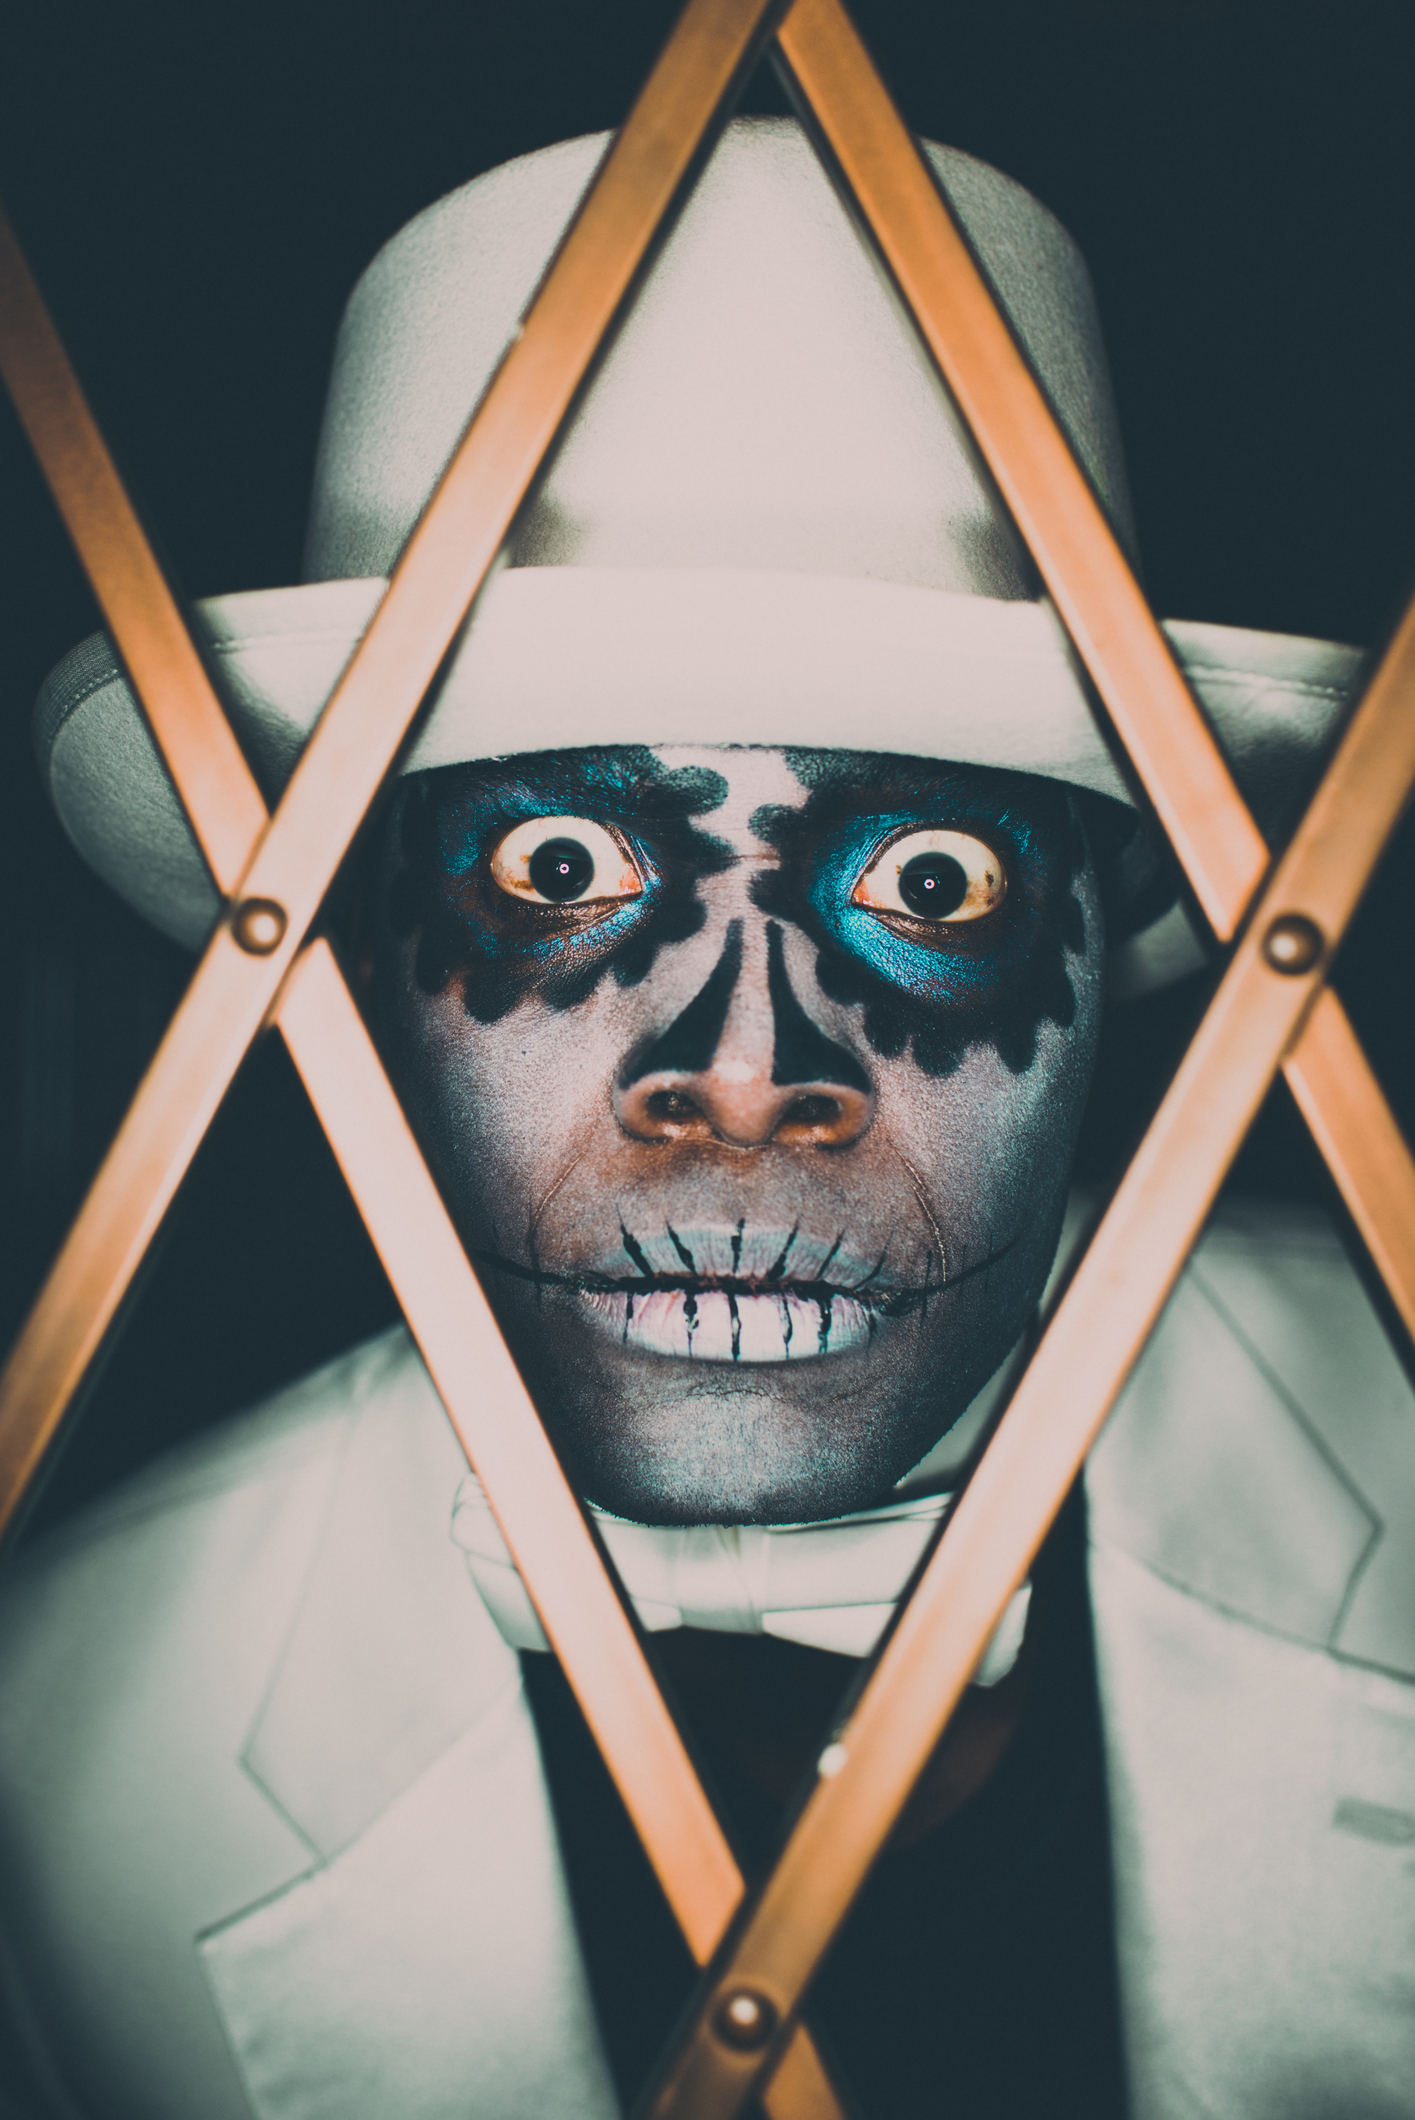 Voodoo Sugar Skull Spooky Man Portrait